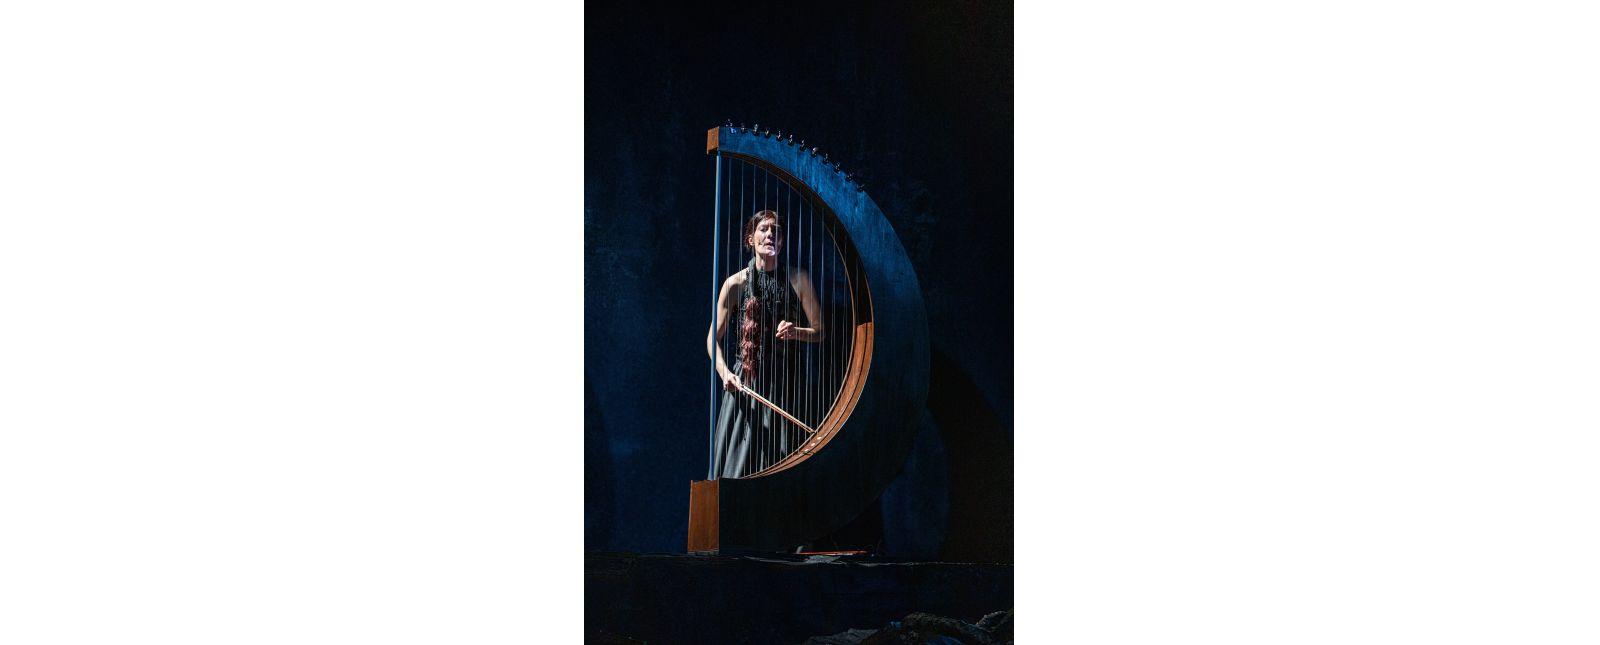 ELEKTRA // Anja Schweitzer // 2020 // Britt Schilling